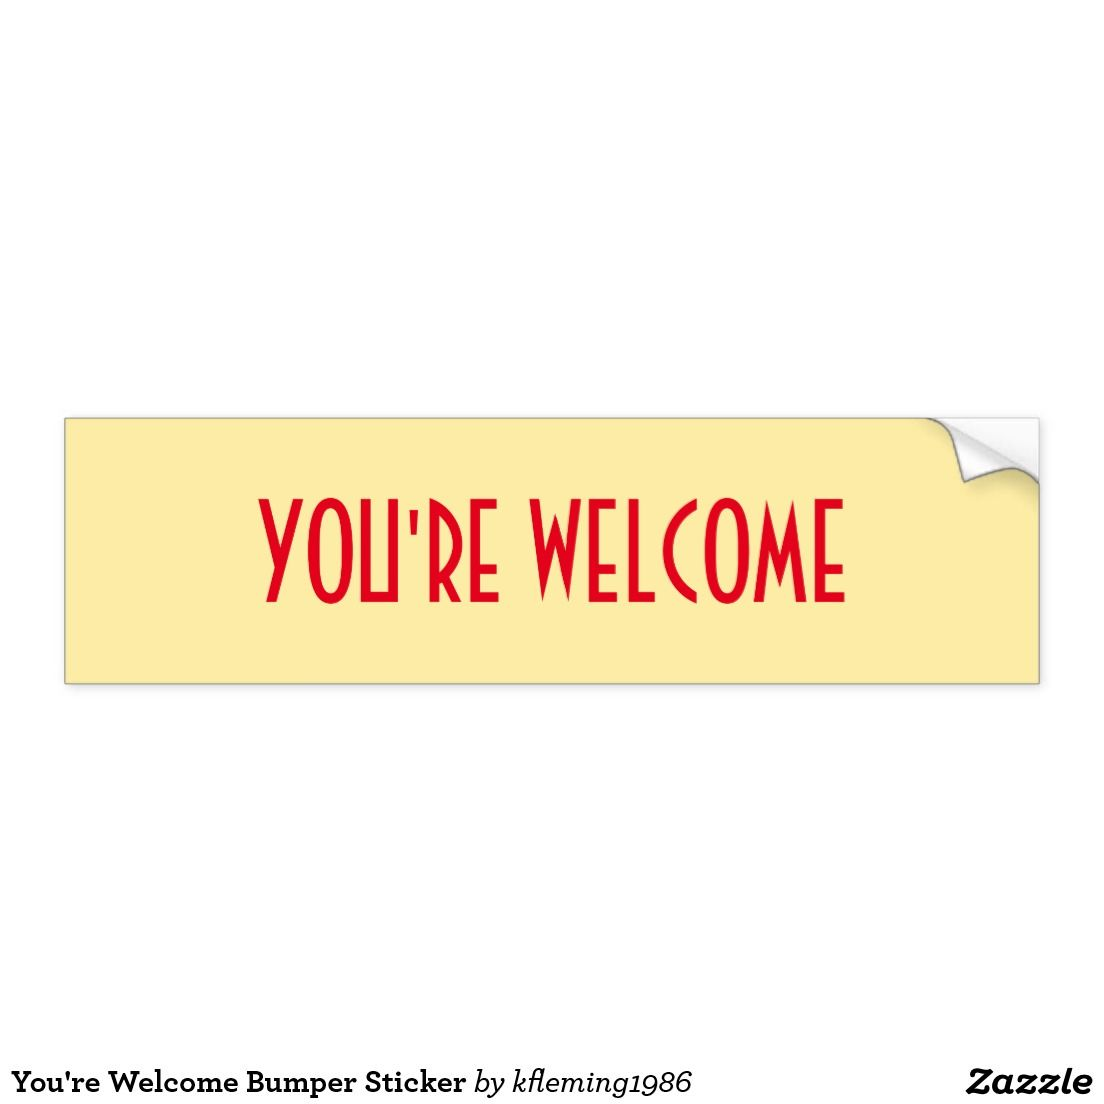 You Re Welcome Bumper Sticker Bumper Stickers Bumpers Stickers [ 1104 x 1104 Pixel ]